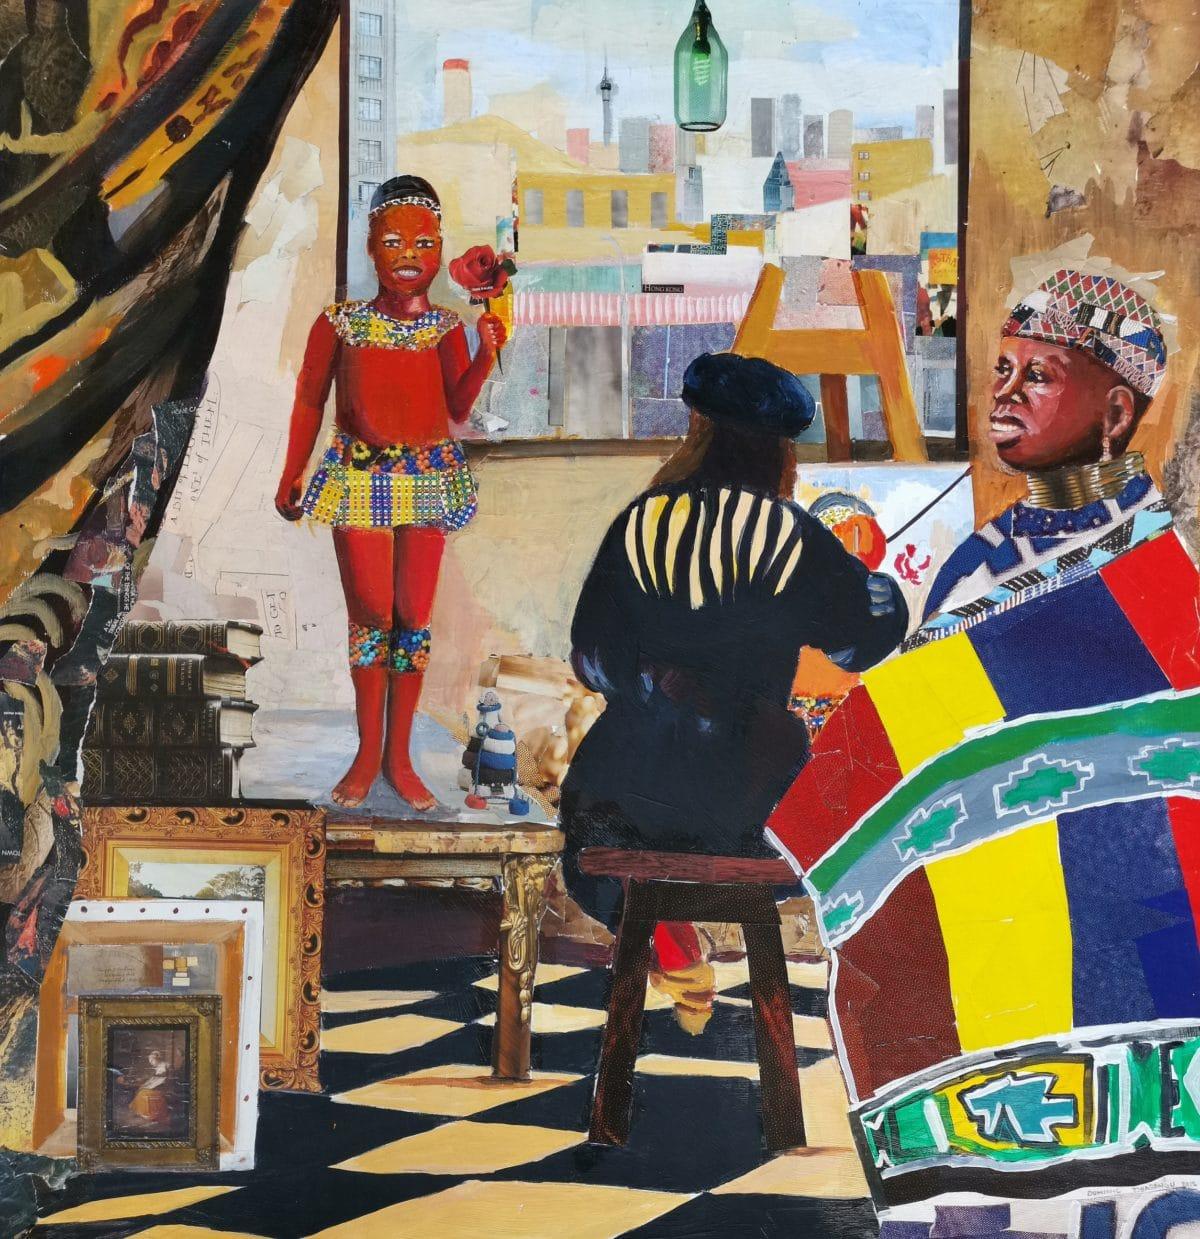 Dominic Tshabangu - Acrylic and Collage on Card - 2016